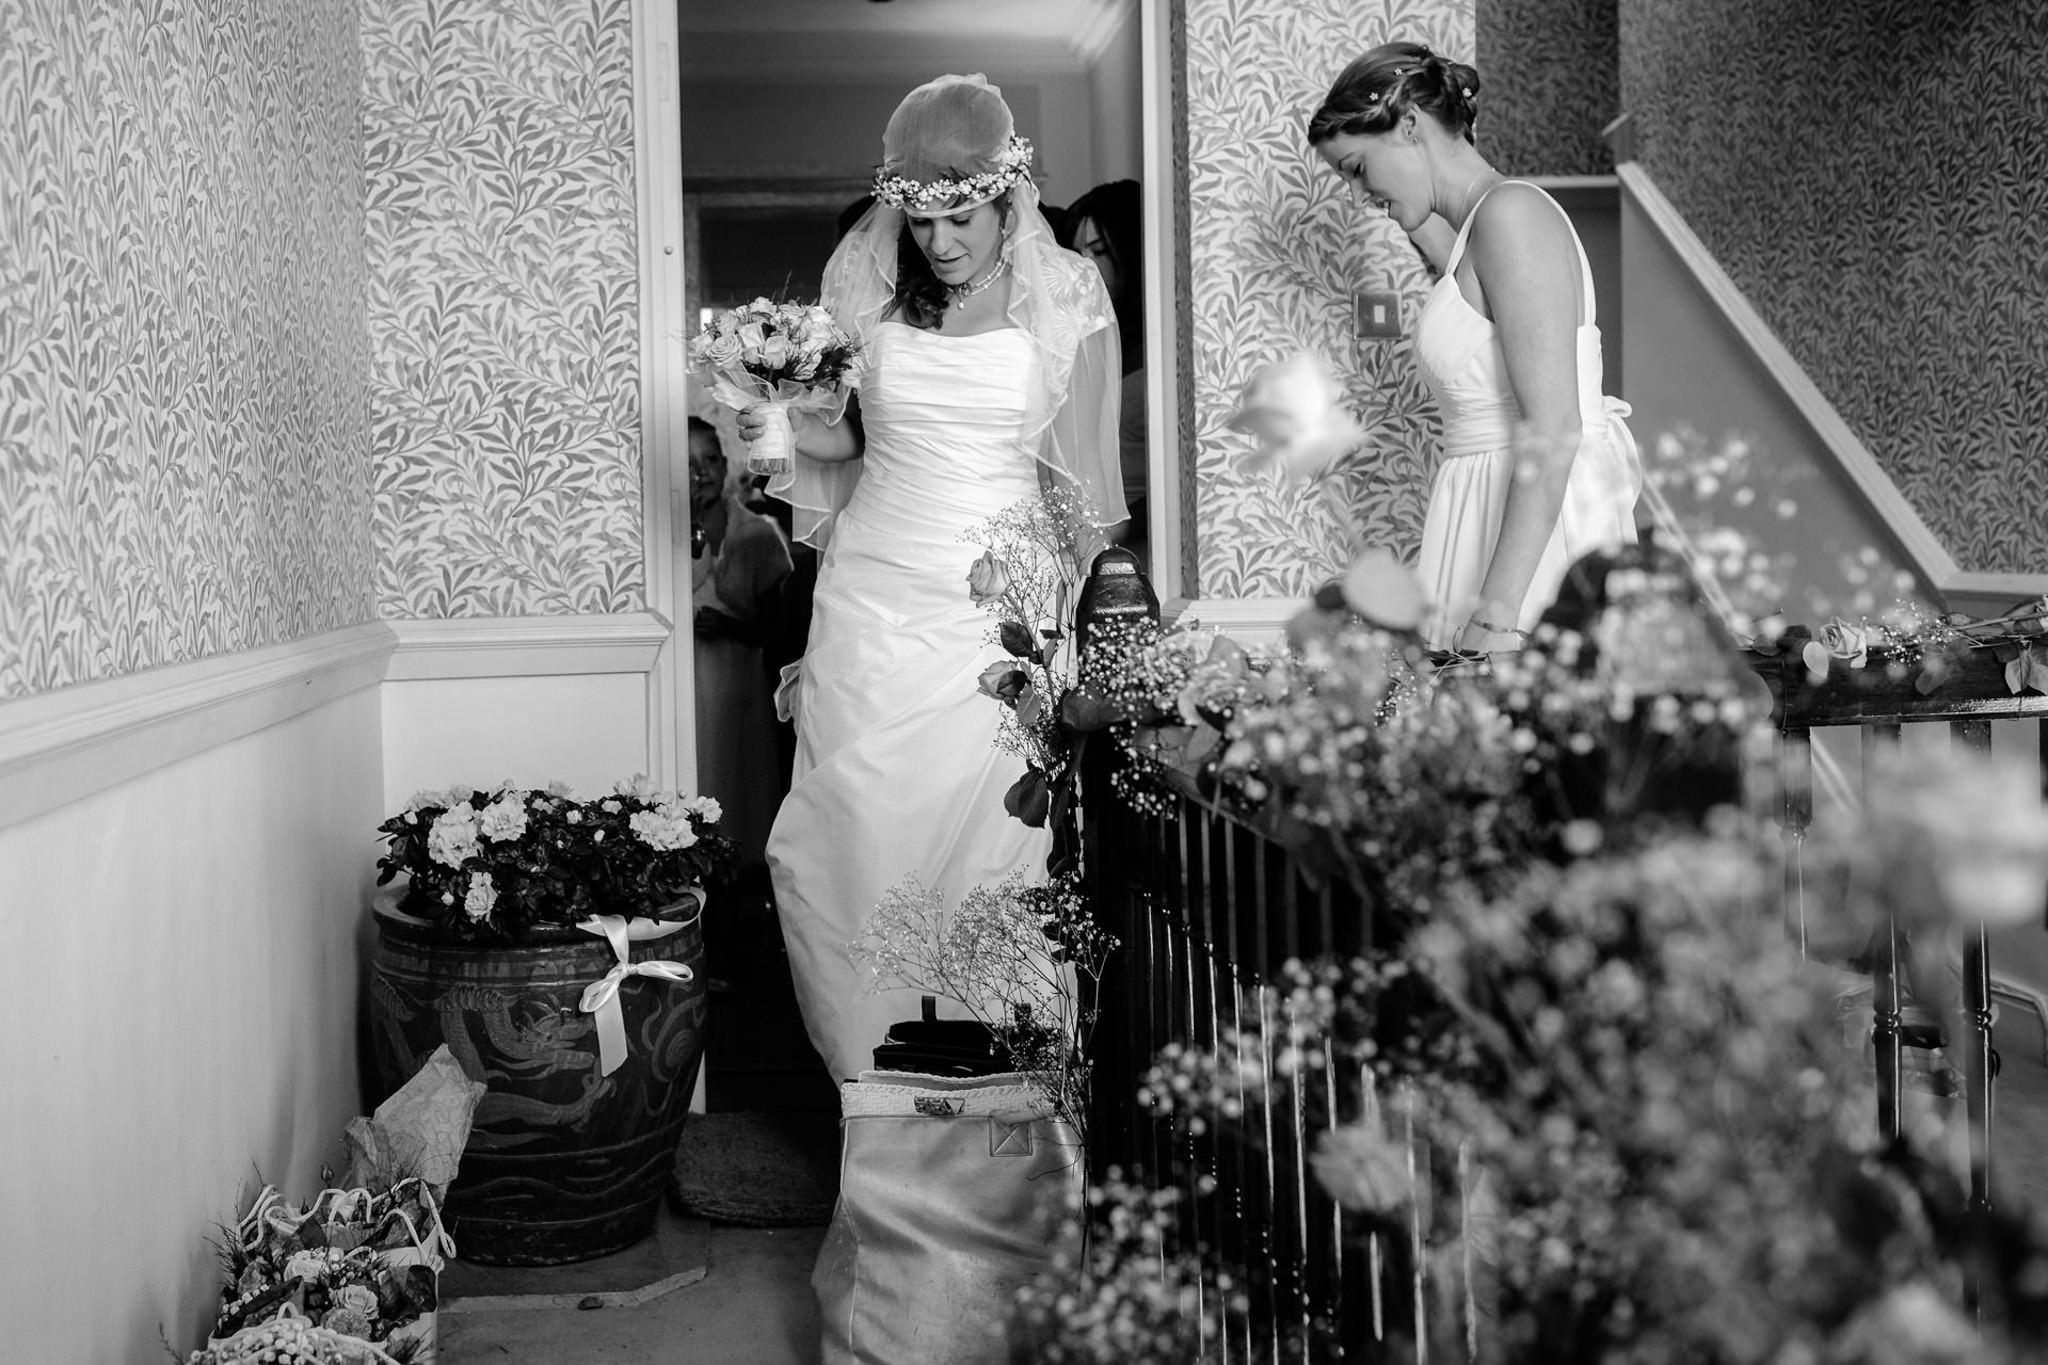 St. Pancras Renaissance hotel wedding bride and bridesmaids leaving home